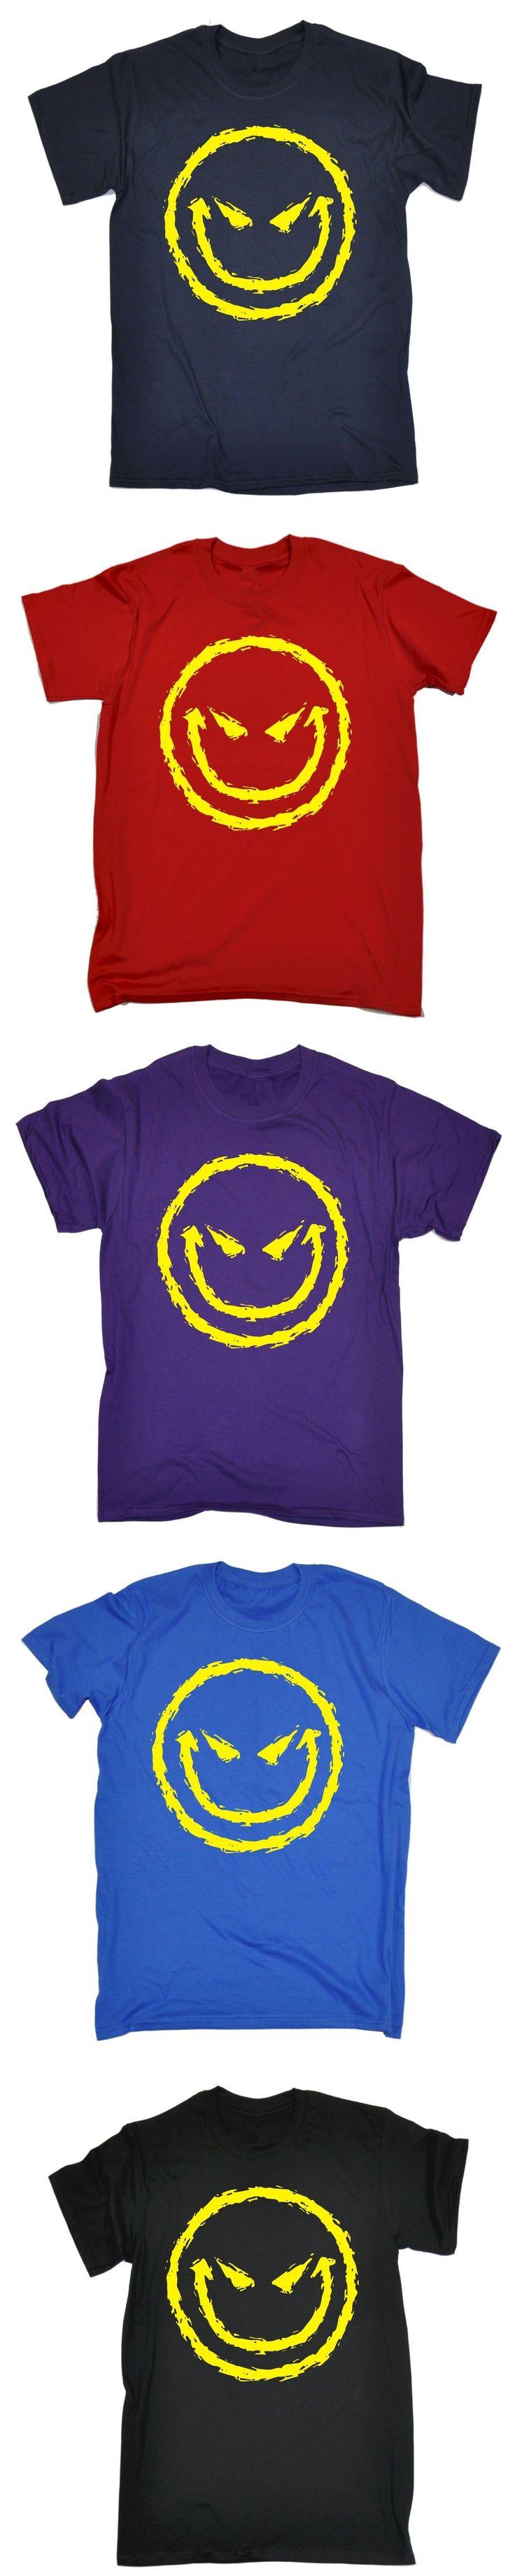 Evil Smiley Face T-SHIRT Cool Dj Attitude Rave Bad Demonic Funny Gift birthday Normal Short Sleeve Cotton T Shirts